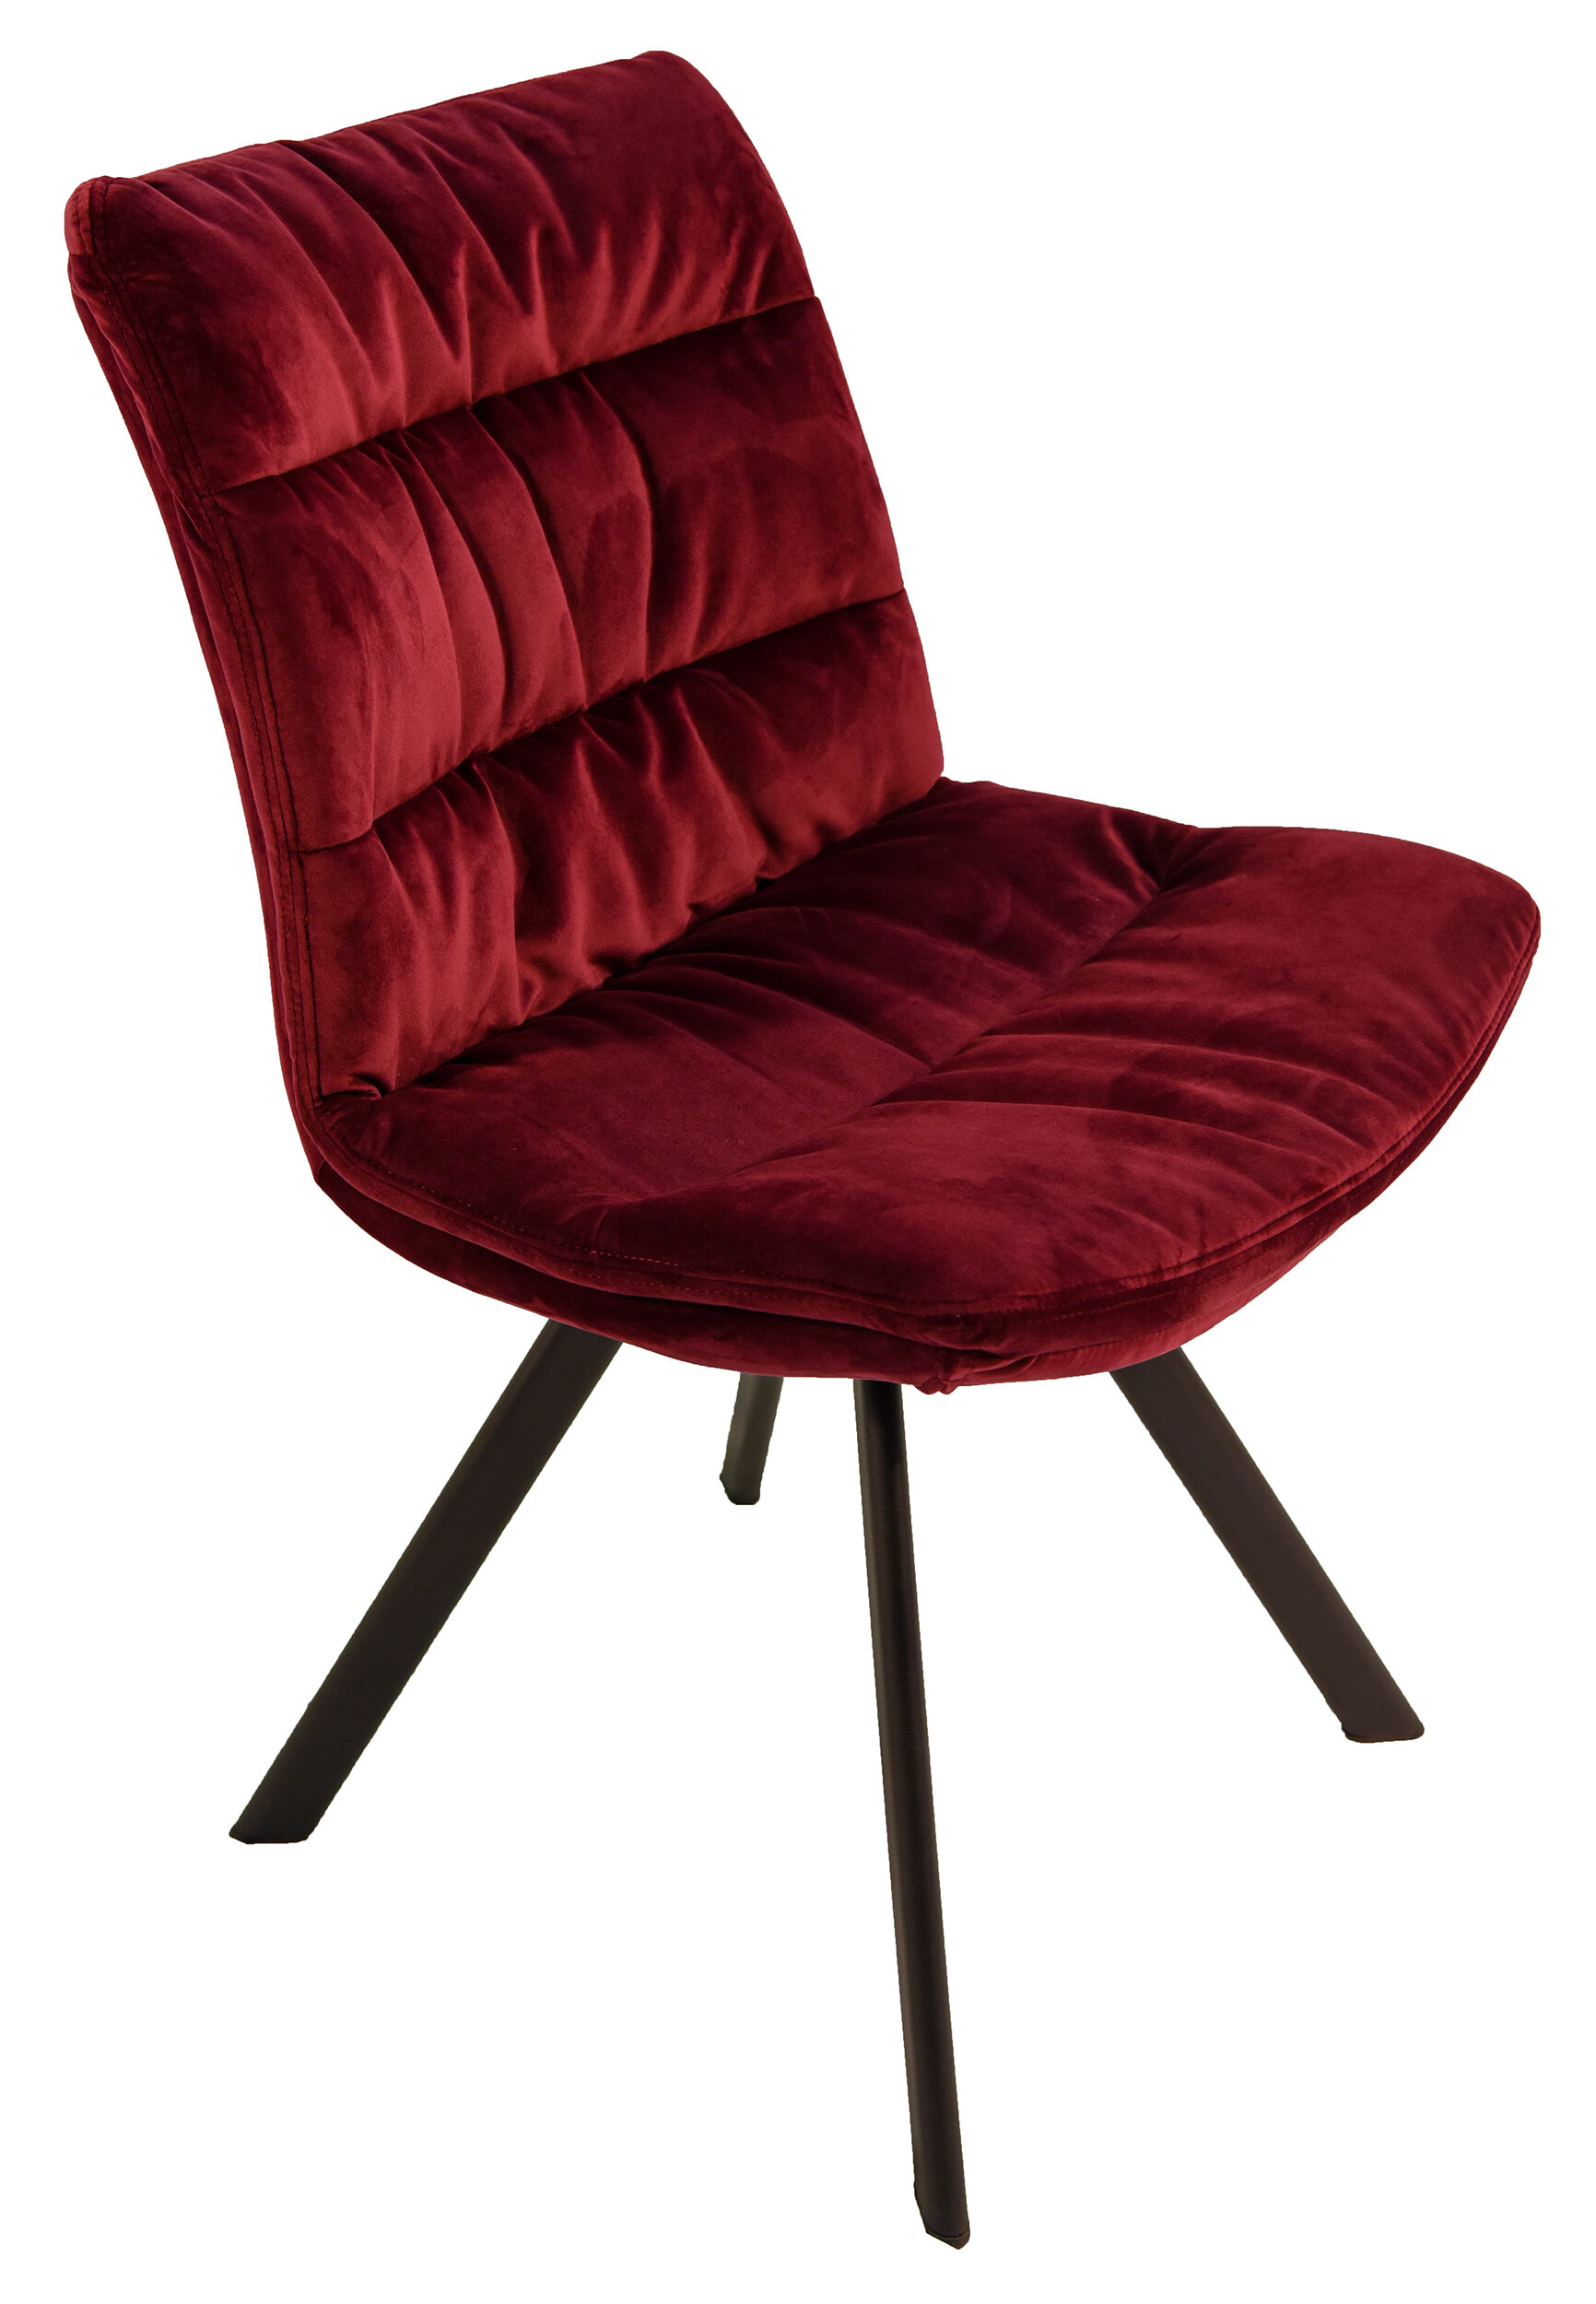 Corrigan Studio Swiftsure Upholstered Dining Chair Reviews Wayfair Co Uk